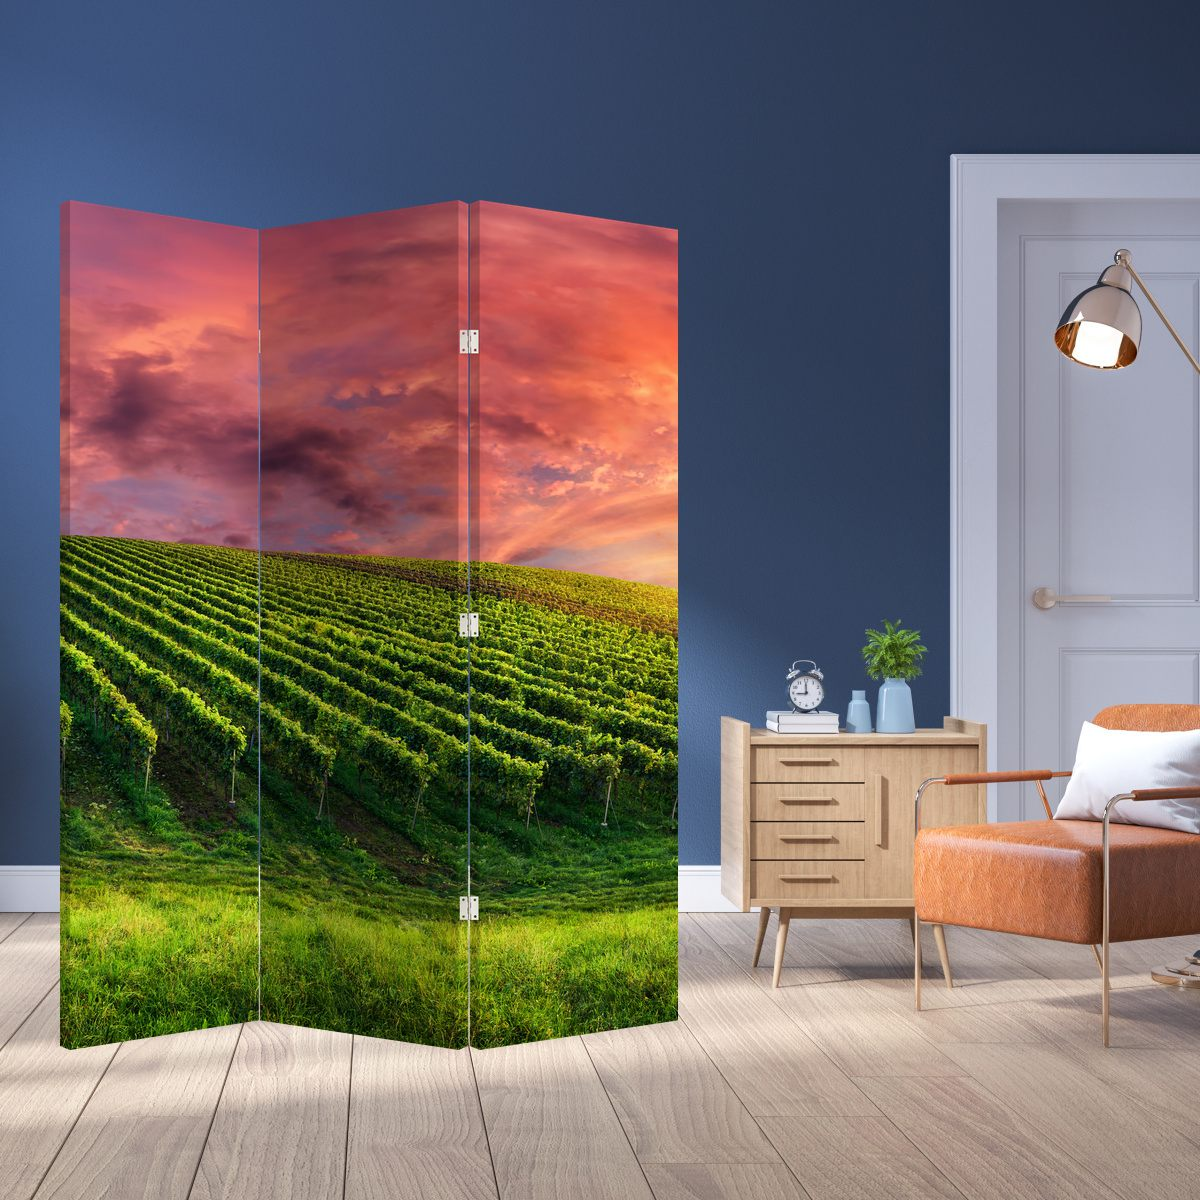 Paraván - Vinohrad s farebným nebom (P020336P135180)